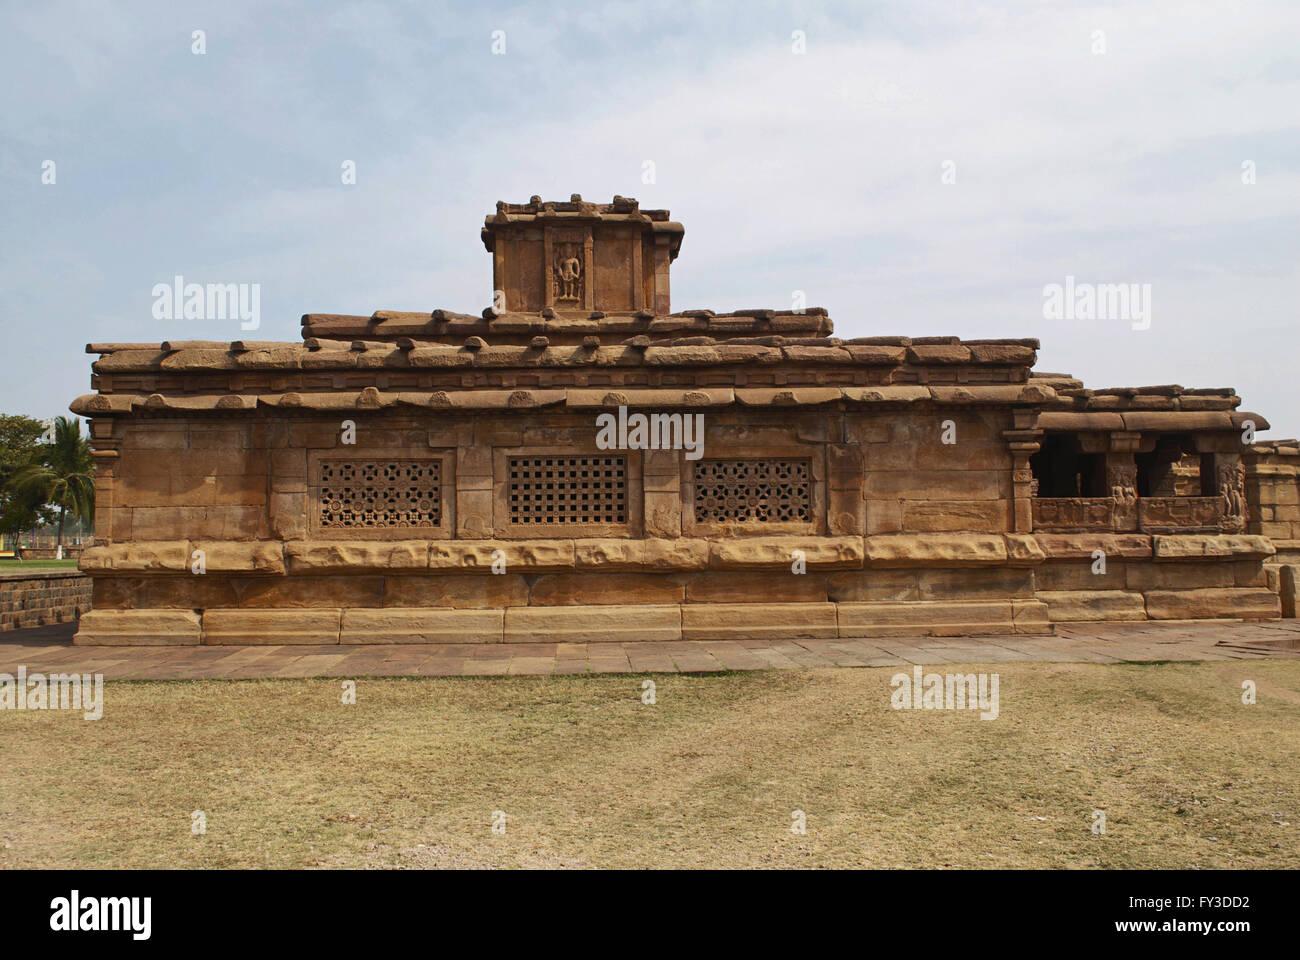 View of Lad Khan temple, Aihole, Bagalkot, Karnataka, India. Kontigudi group of temples. Large windows seen has - Stock Image